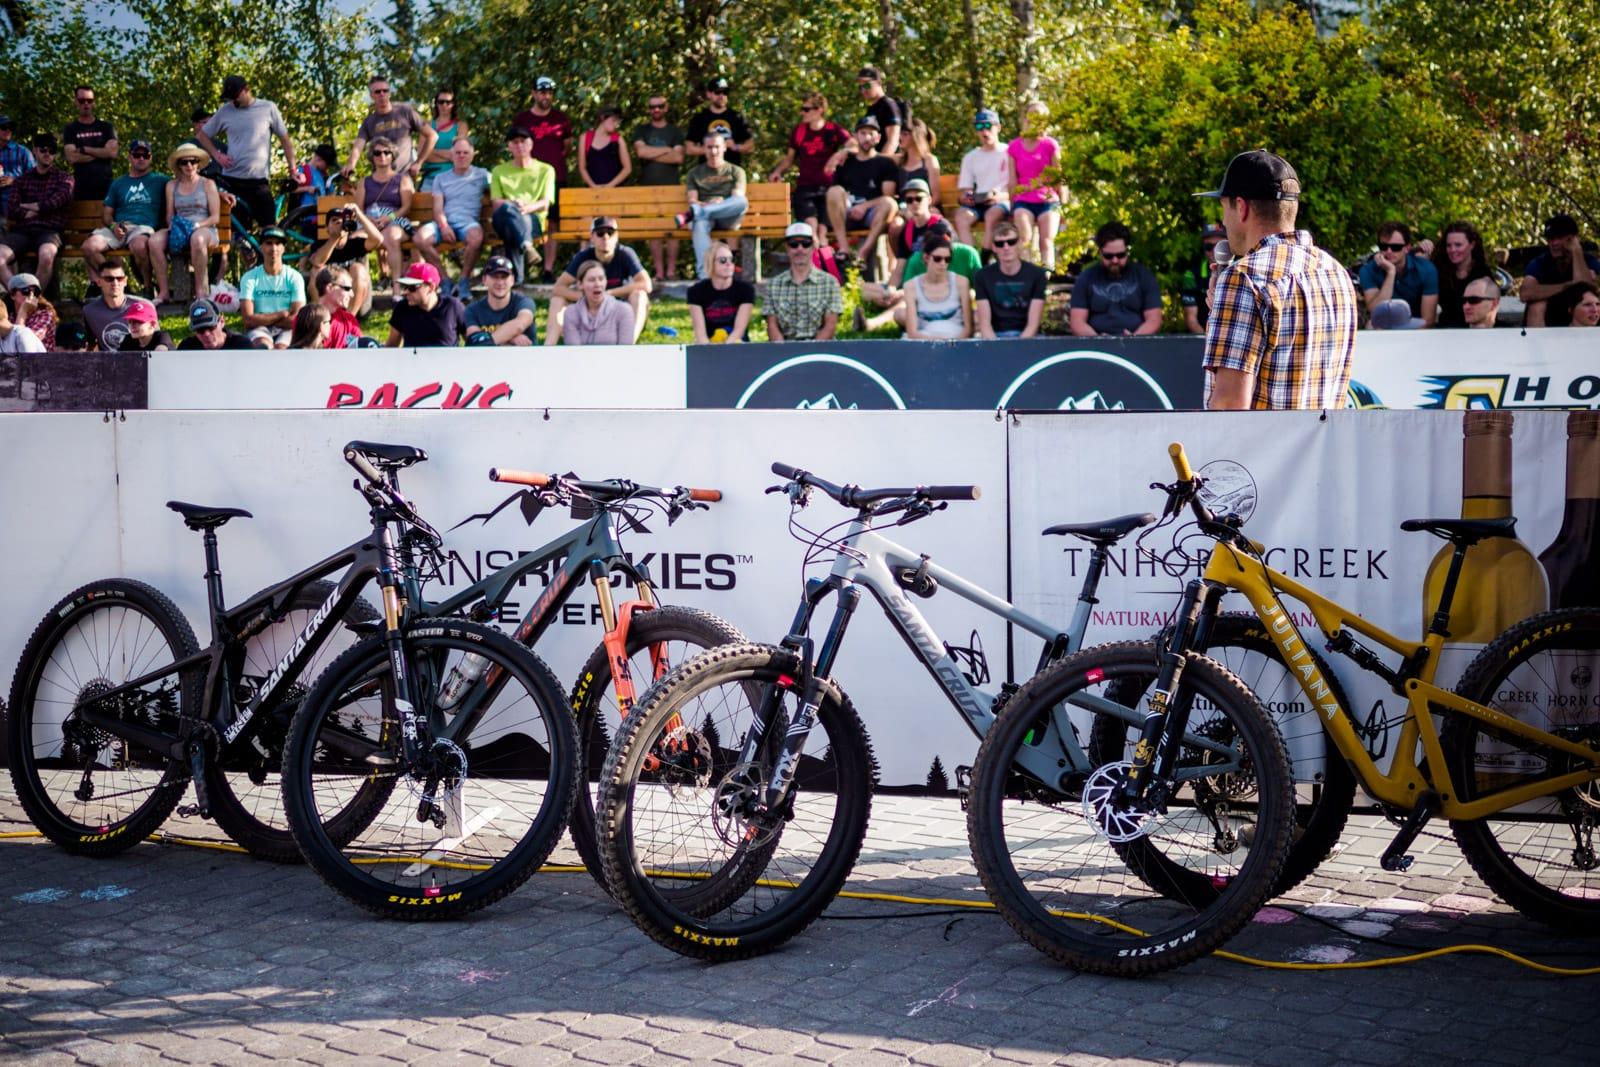 Santa Cruz Bicycles - Line'em Up for Singletrack6 Start